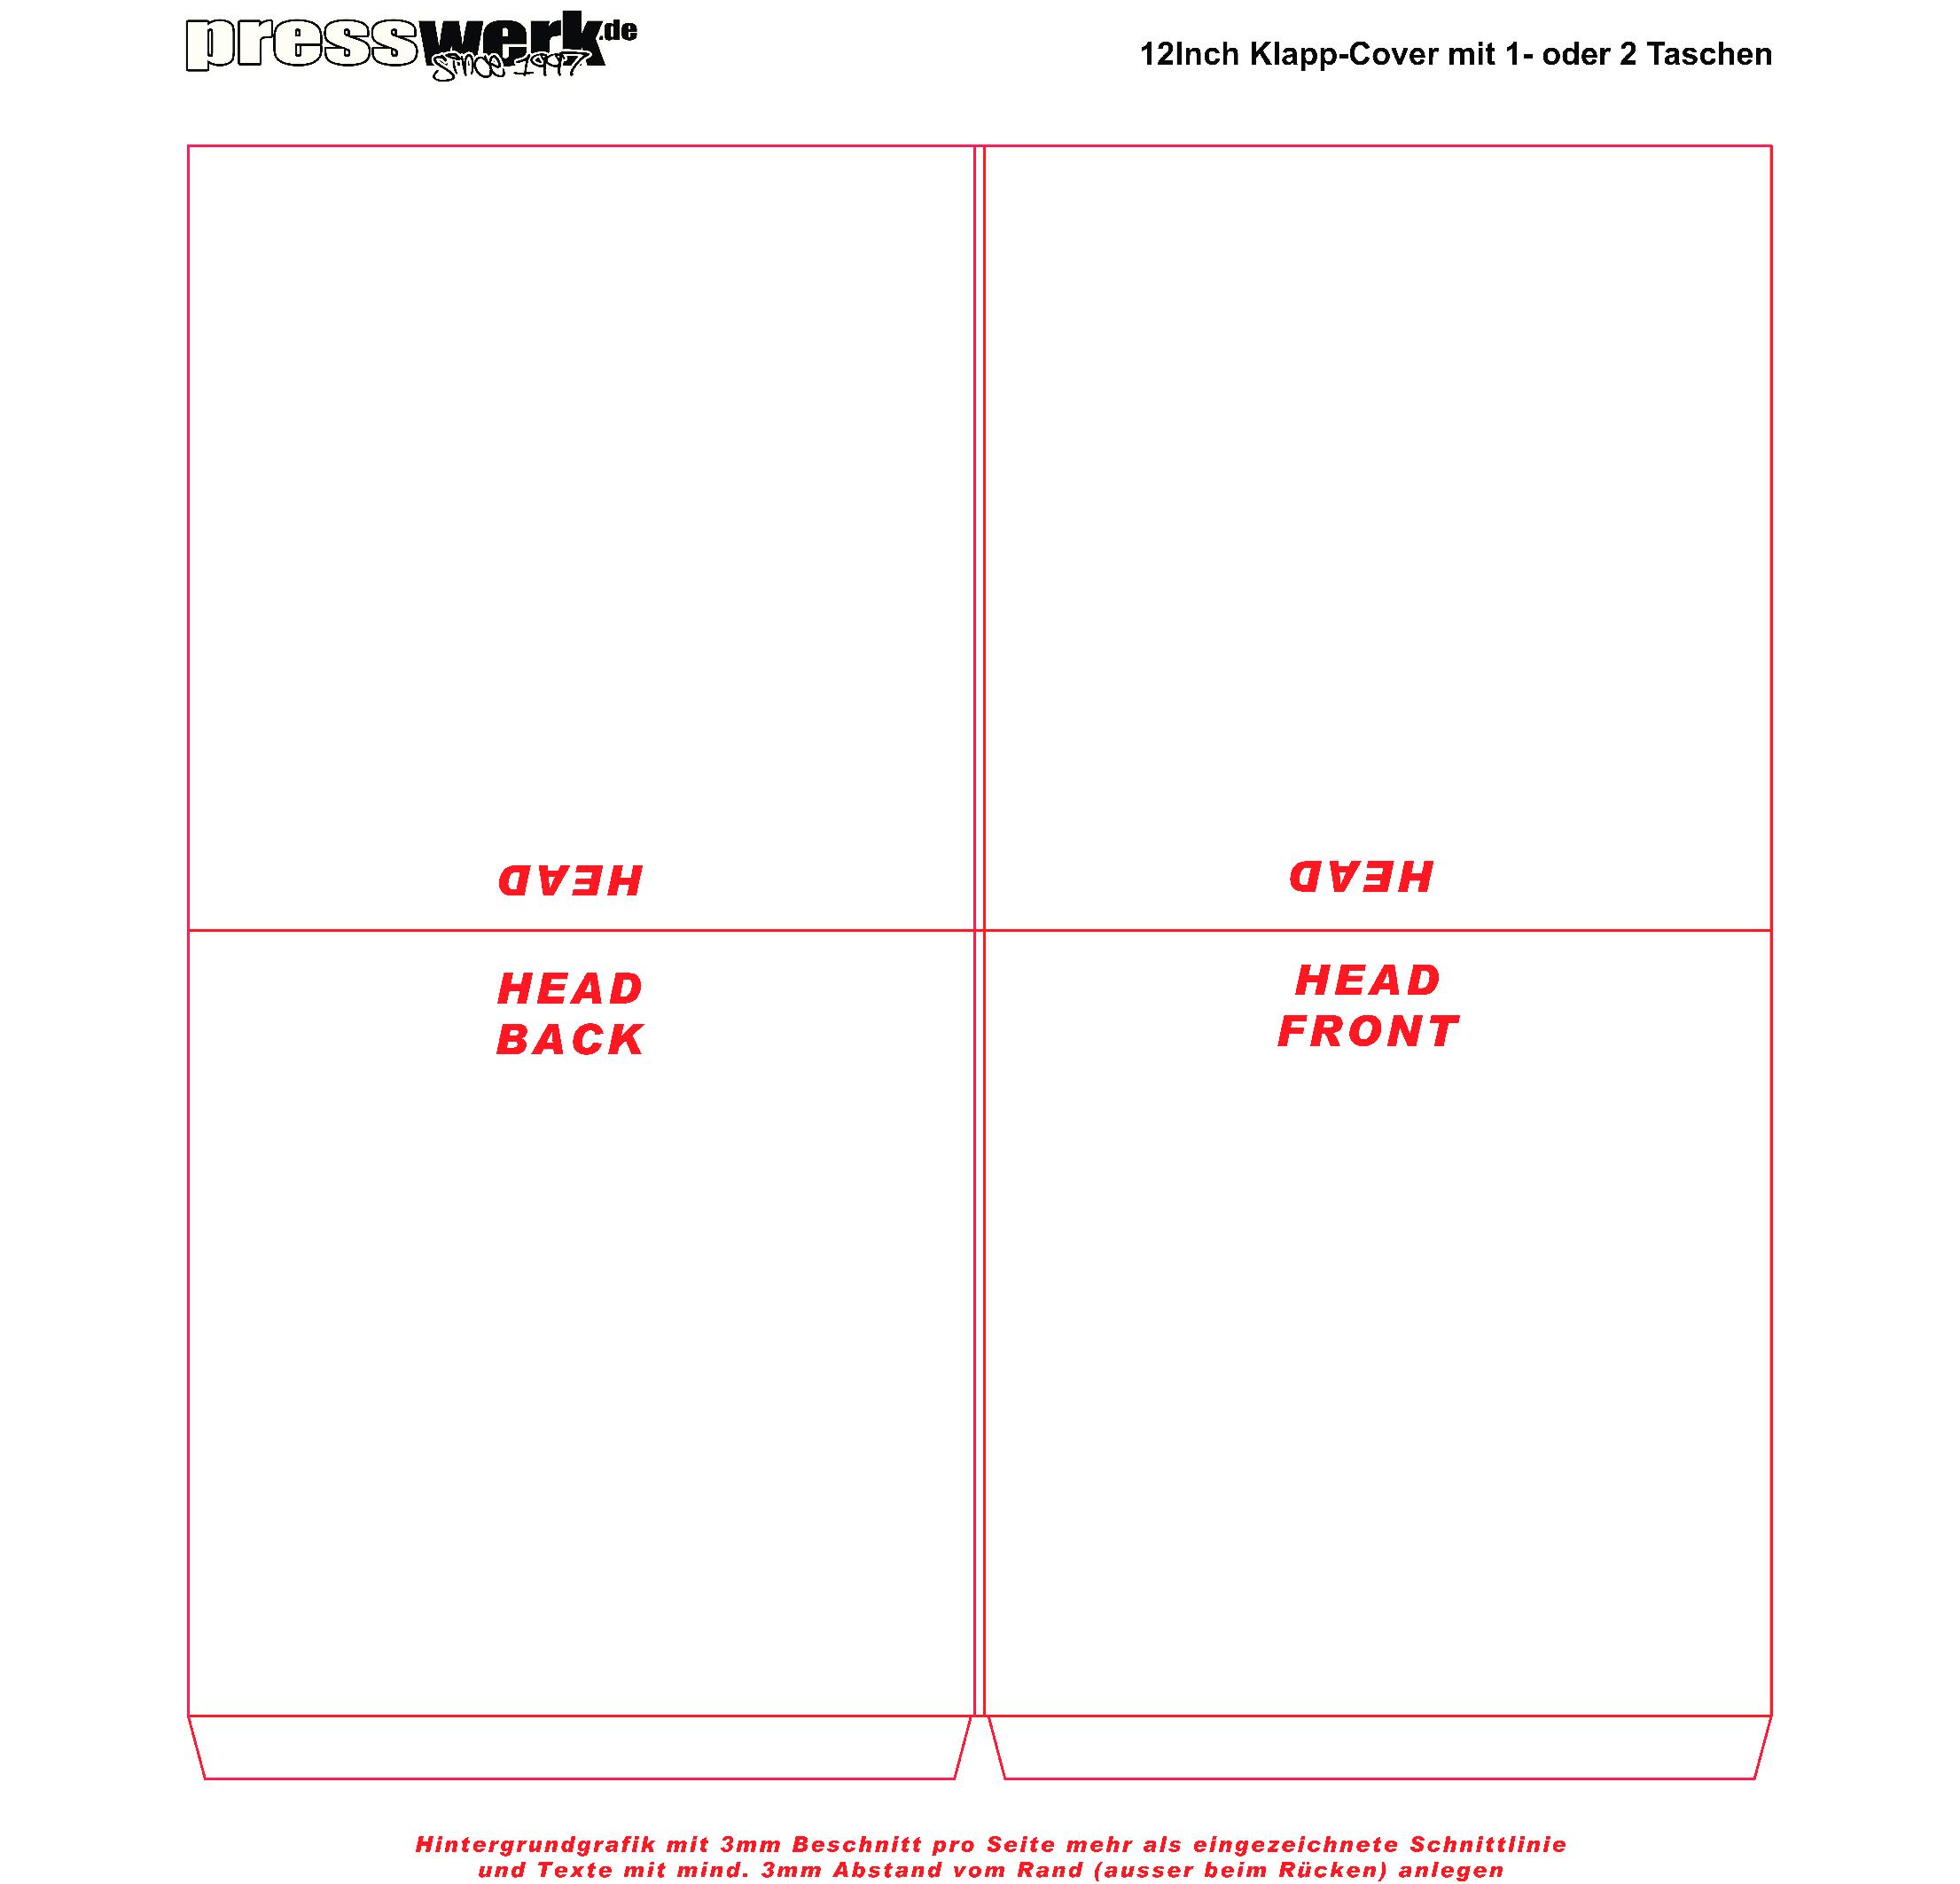 presswerk_de_12-Klapp-Cover-Template_300dpiCMYK.pdf